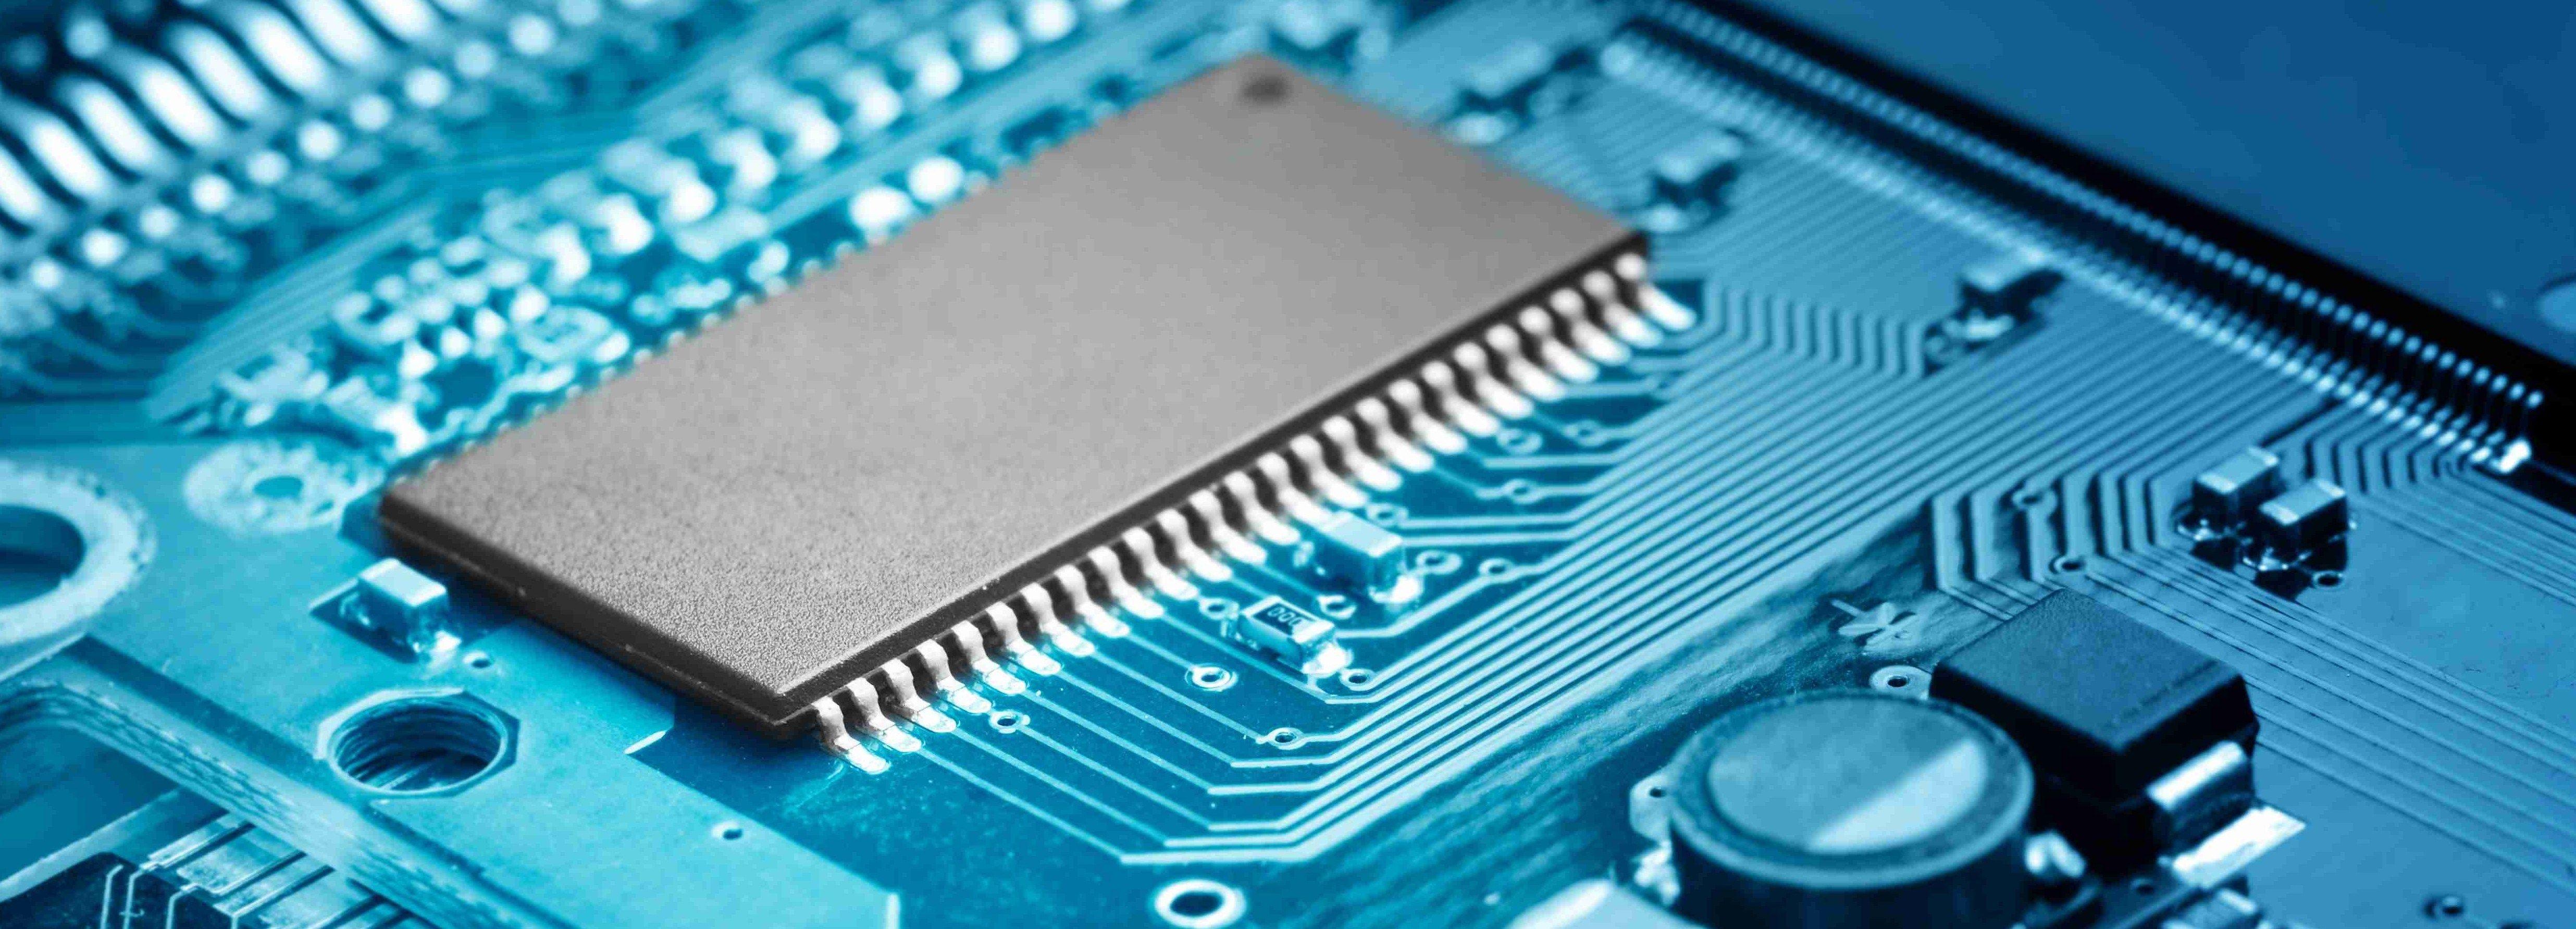 Circuit Hd Wallpaper Circuit Category Electronic Circuit Board Electronics Circuit Electronics Projects